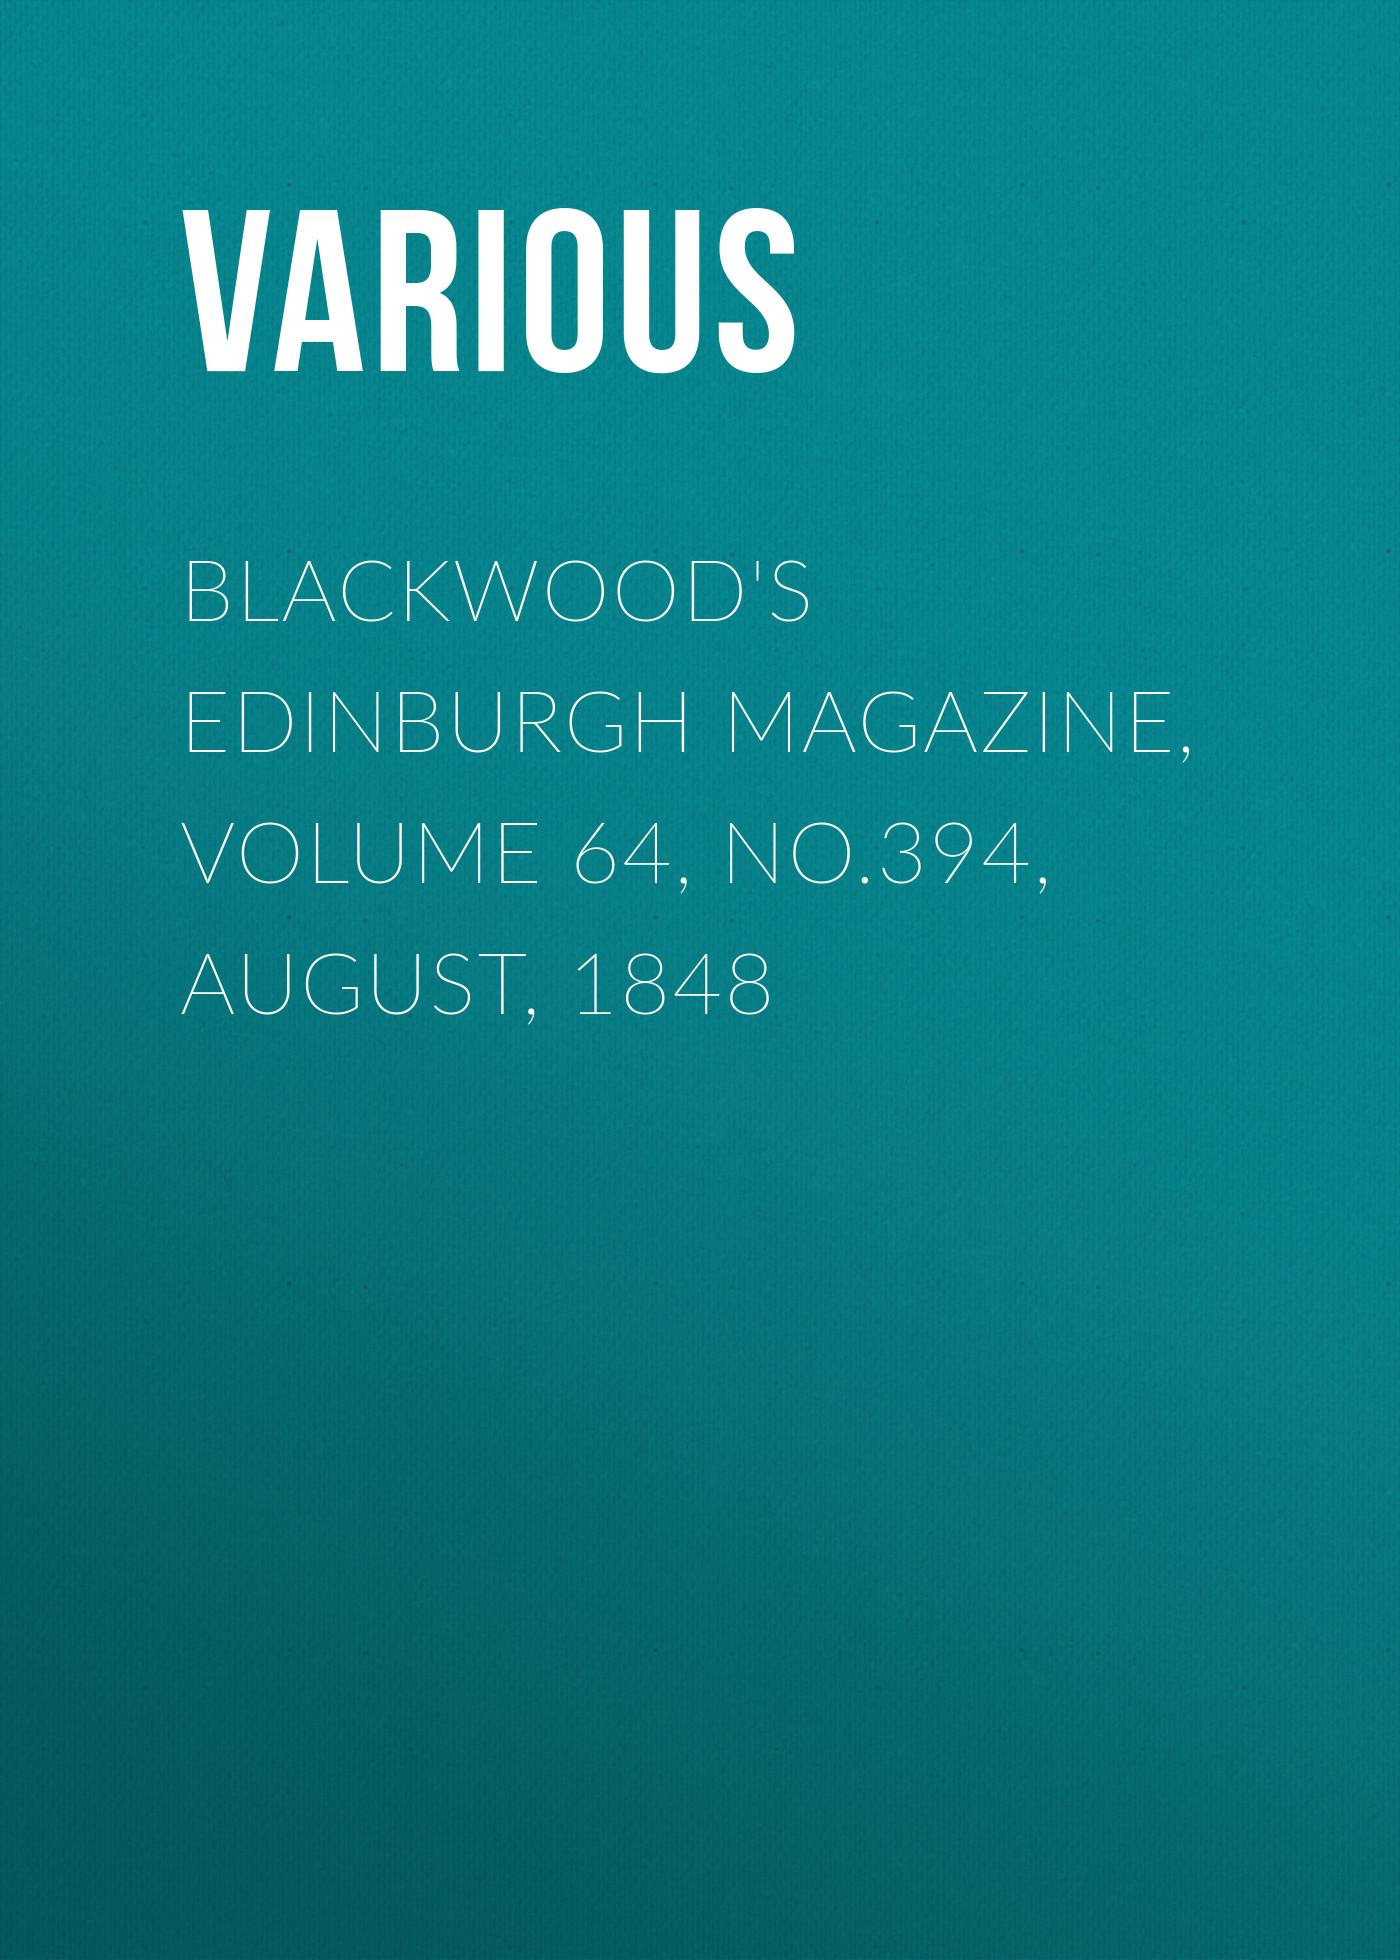 Various Blackwood's Edinburgh Magazine, Volume 64, No.394, August, 1848